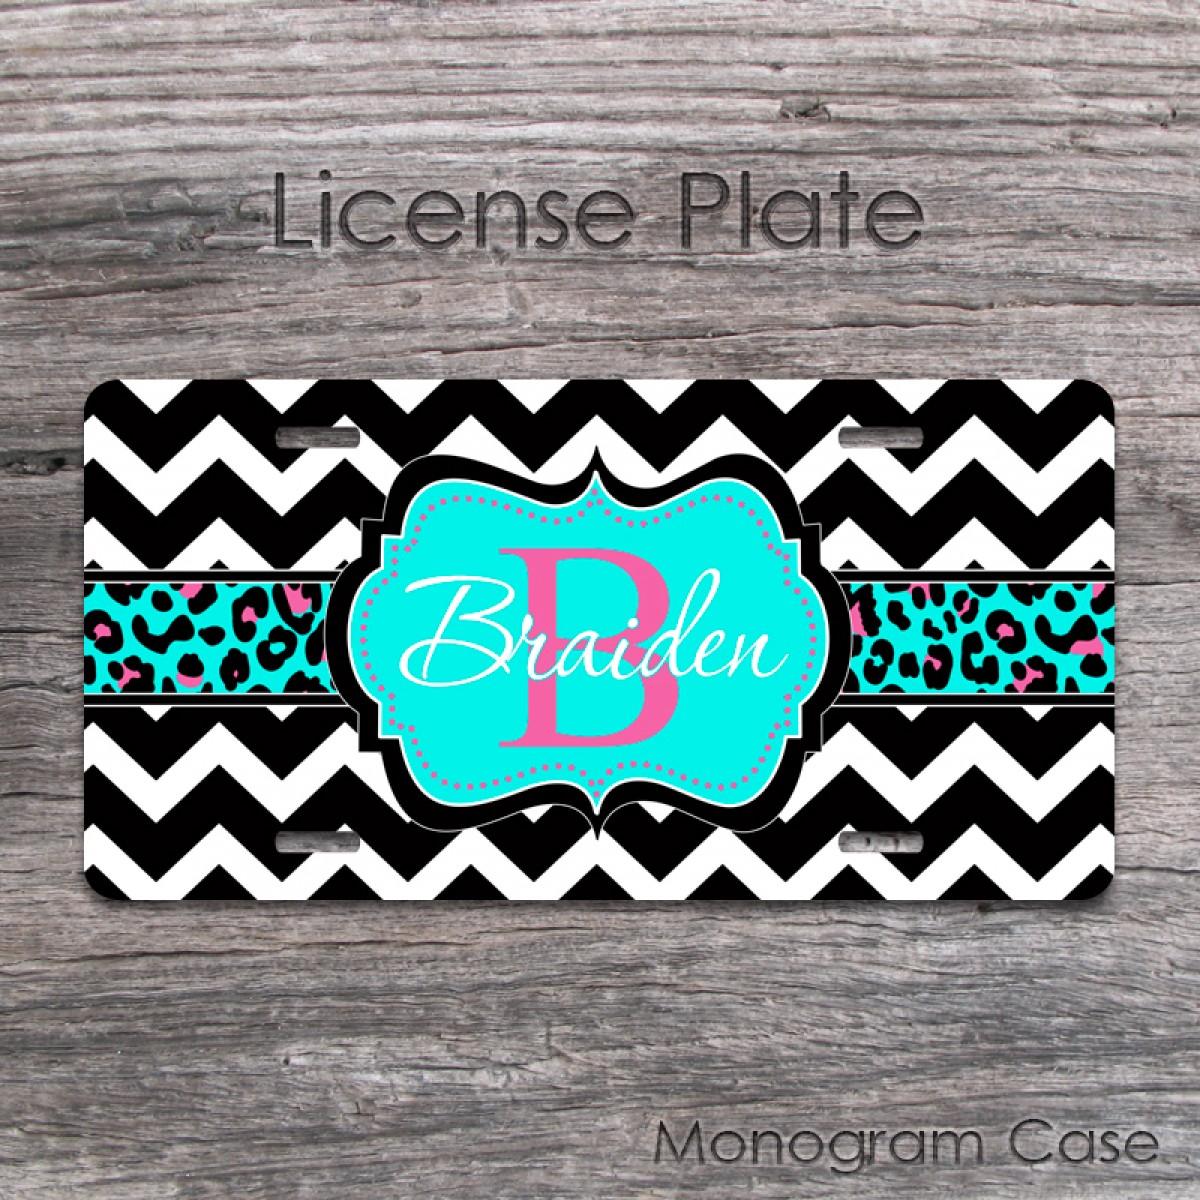 Custom license plate aqua pink animal print   MonogramCase